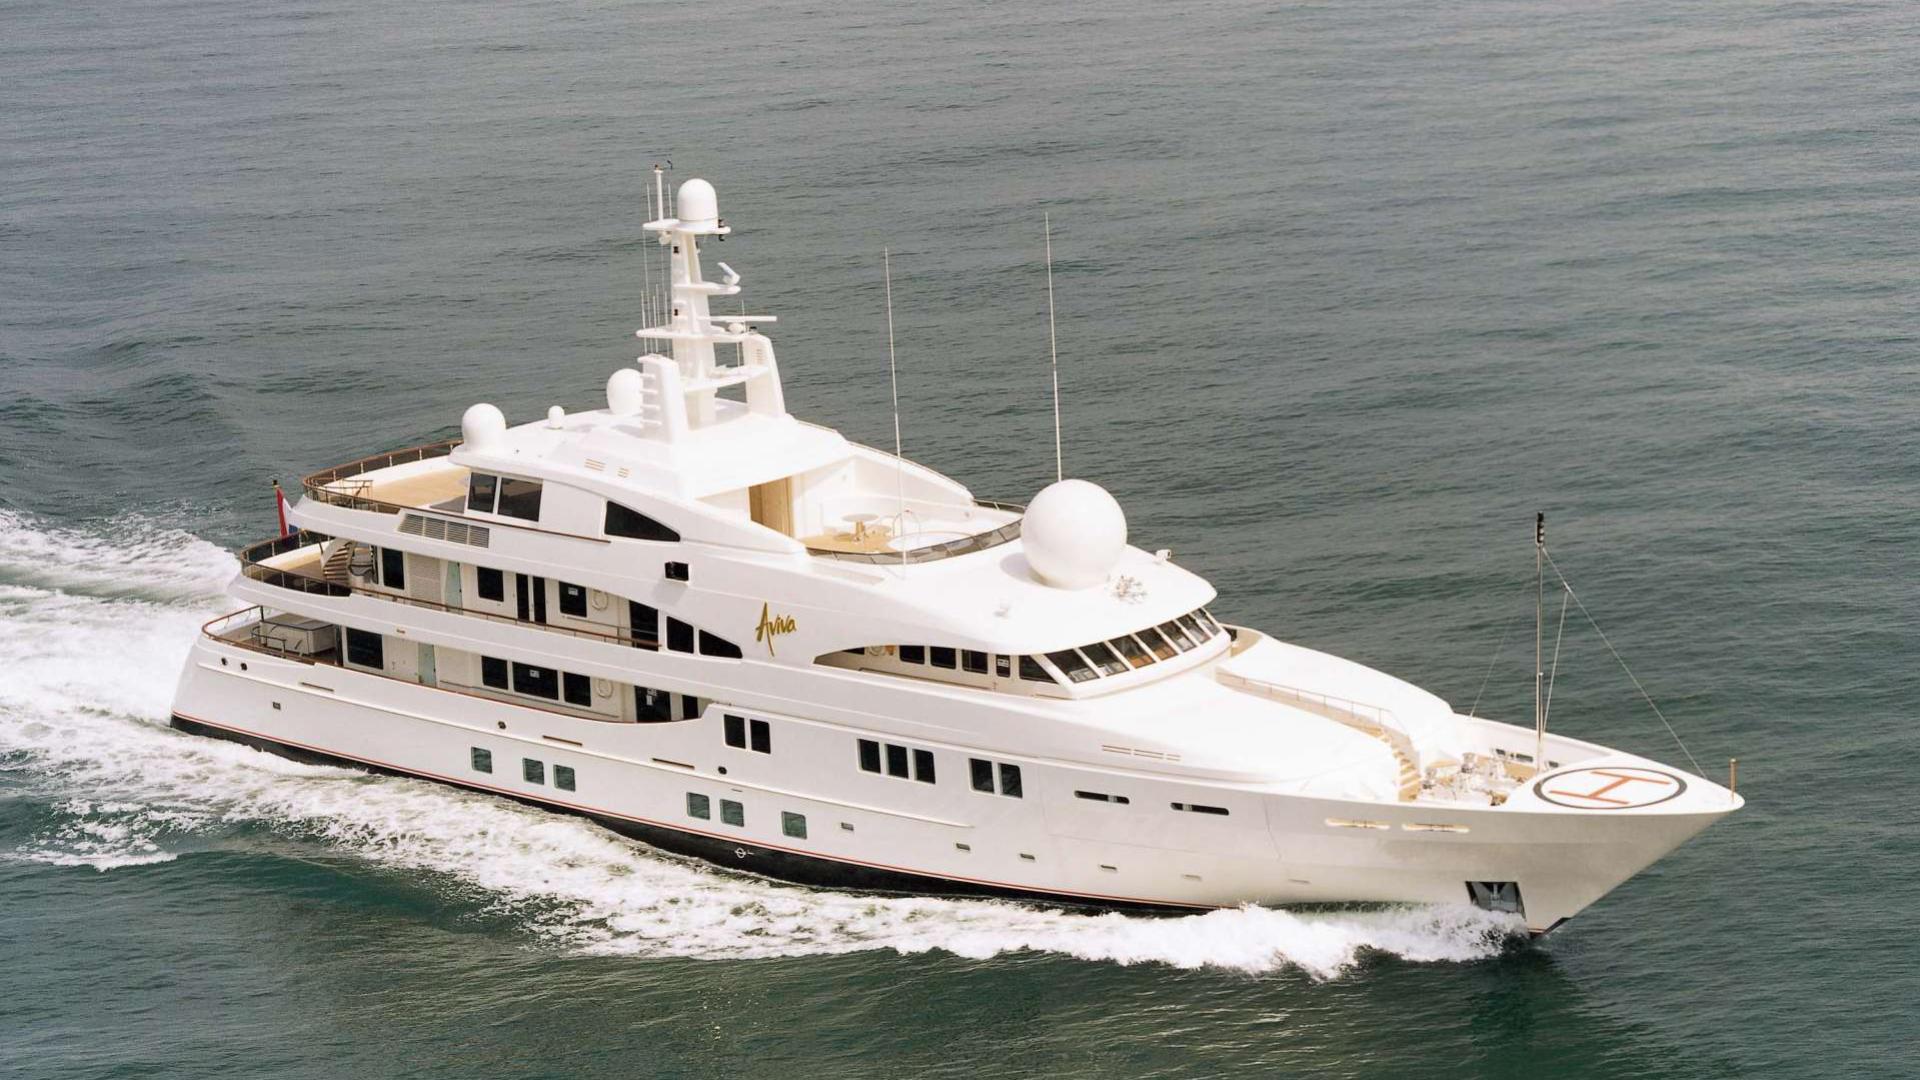 attessa-motor-yacht-feadship-1998-69m-cruising